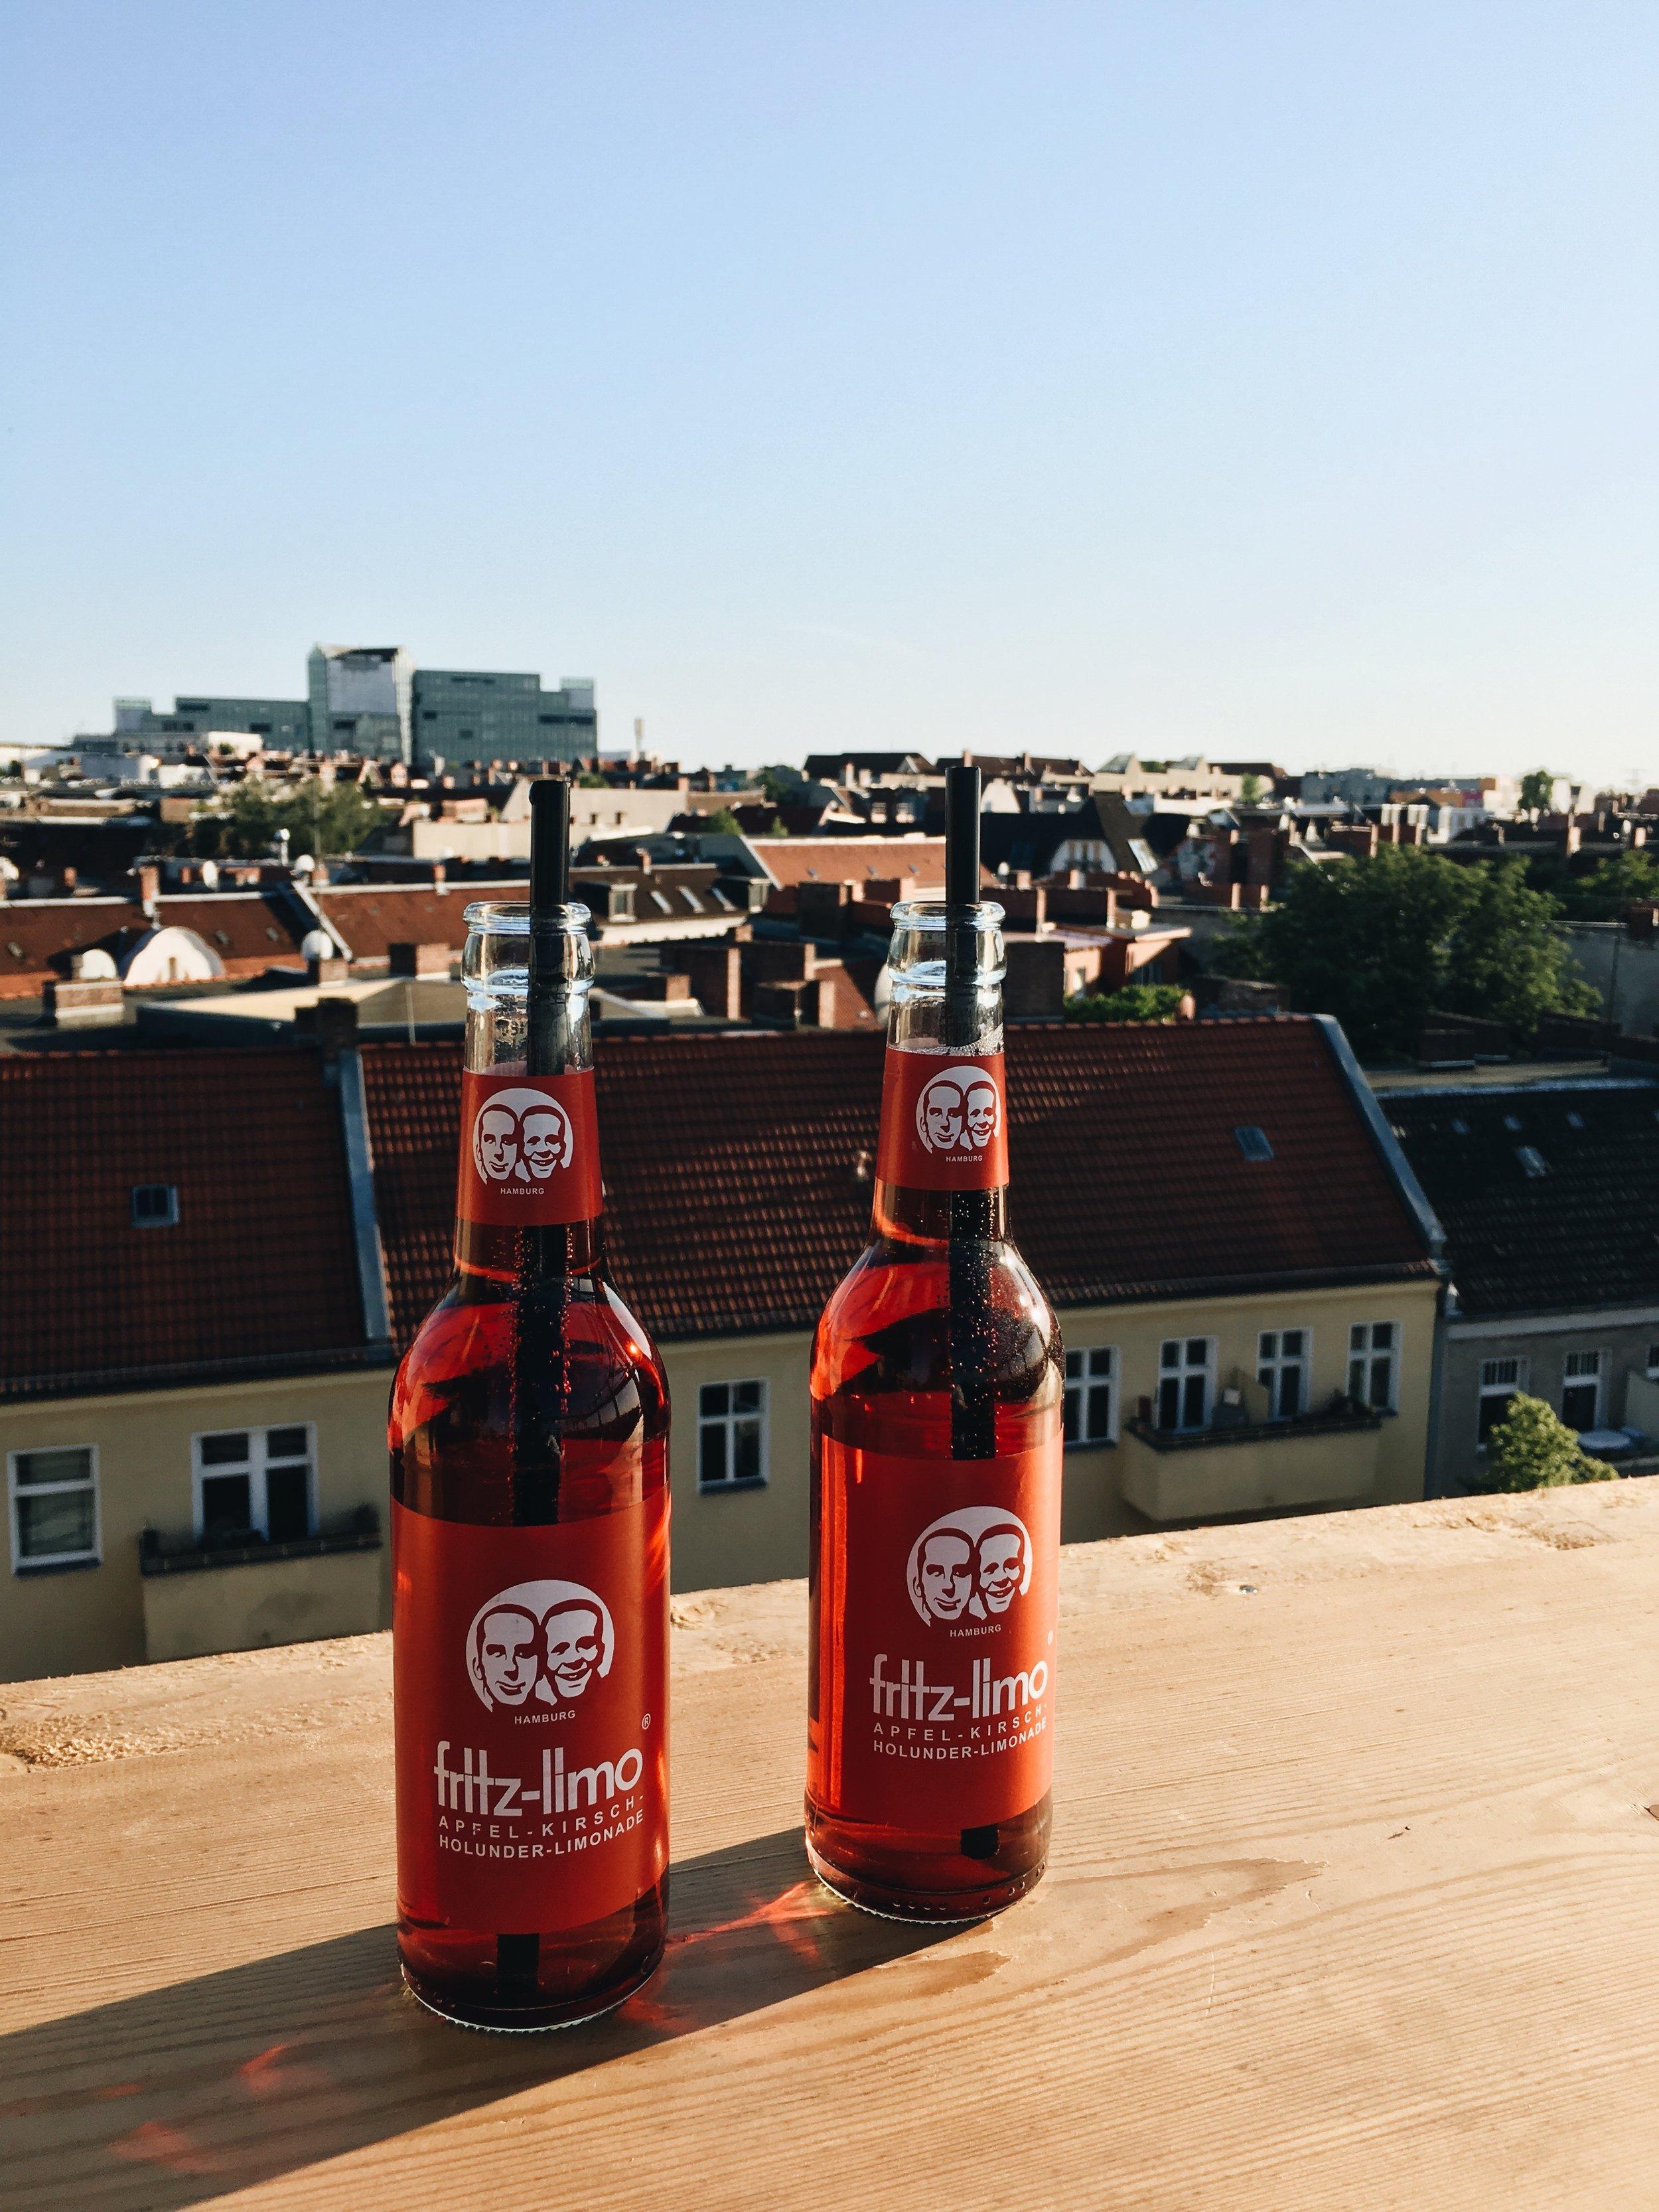 Klunkerkranich - located on top of a shopping centre in Neuköln, best summer rooftop bar, lots of alternative festivals & live music